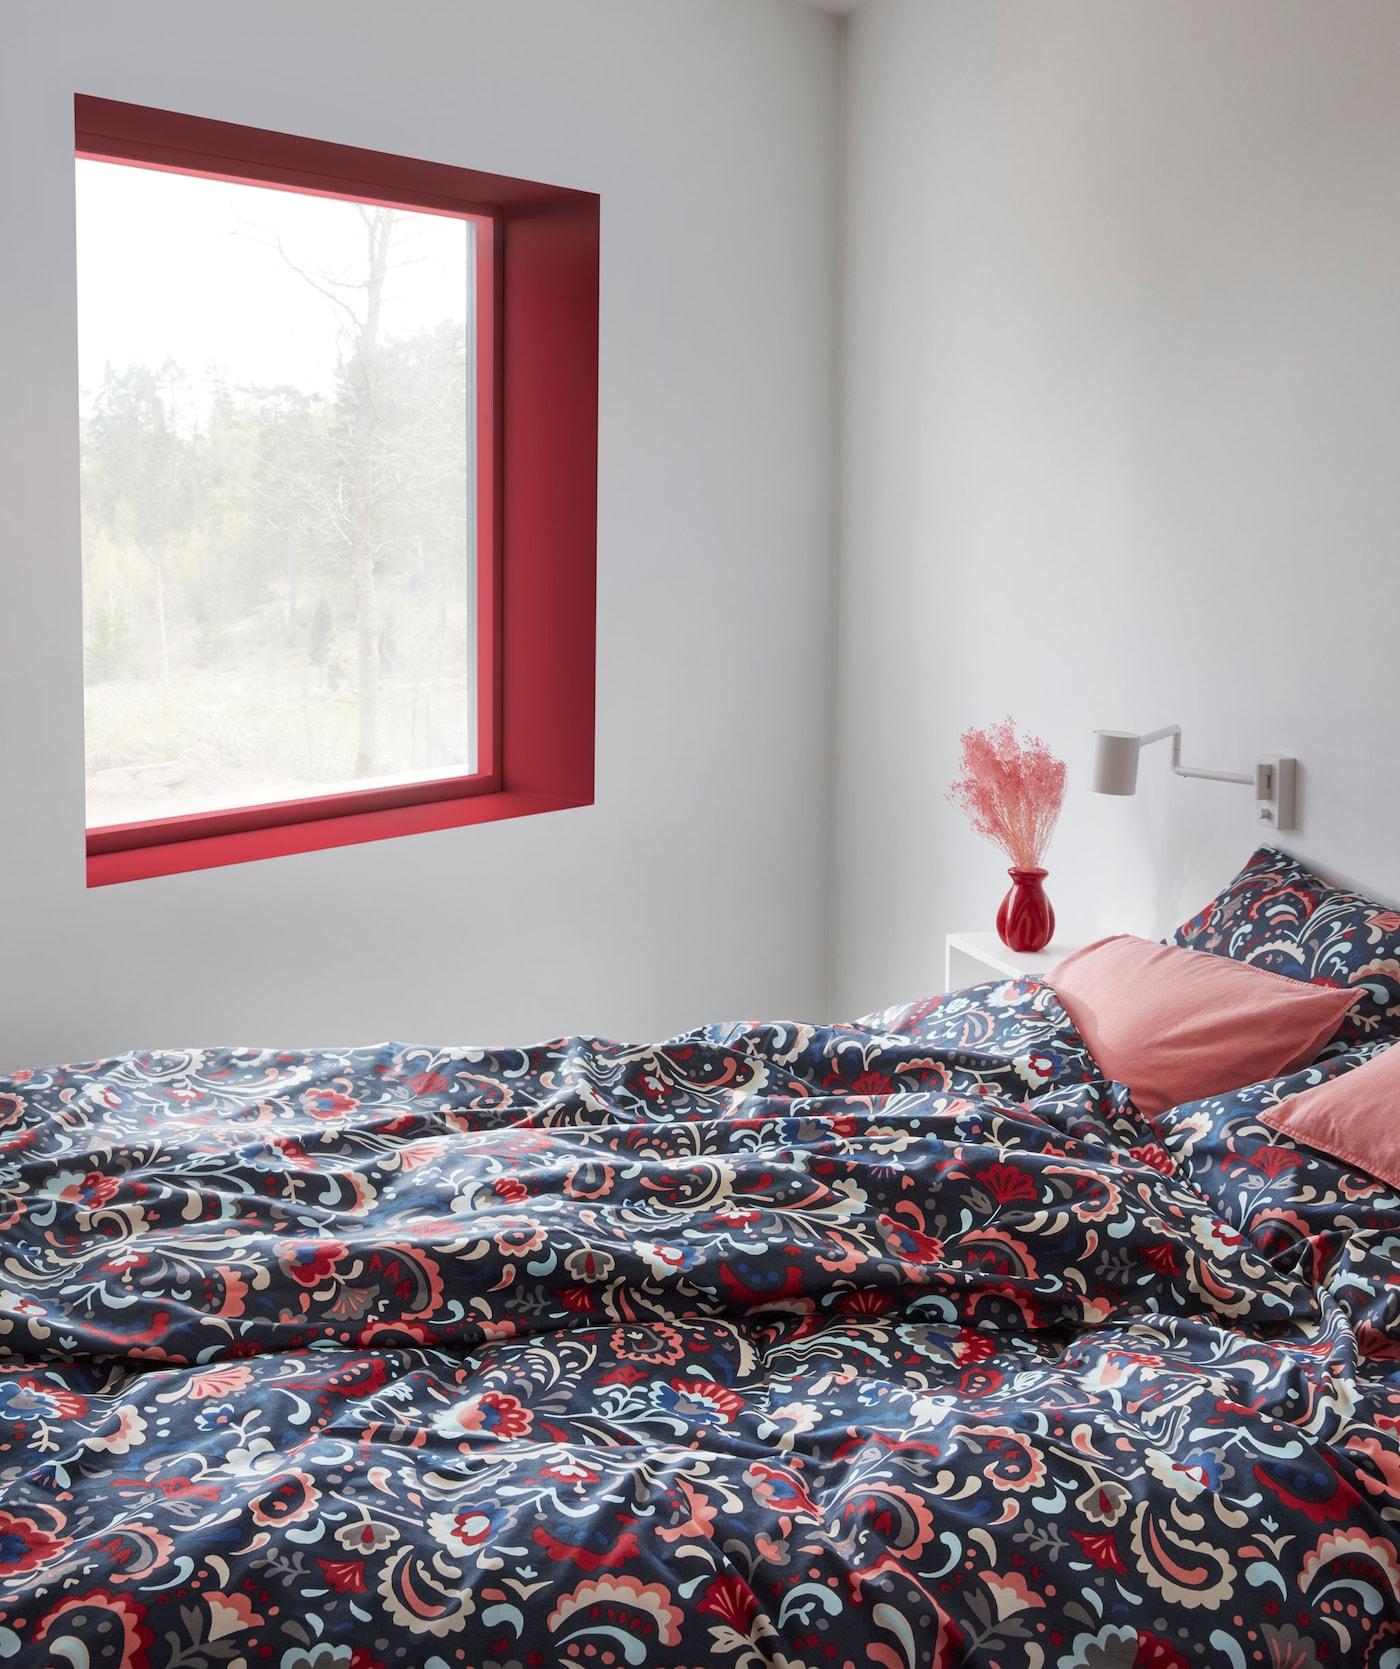 Moderno stile folk scandinavo per la casa IKEA IT